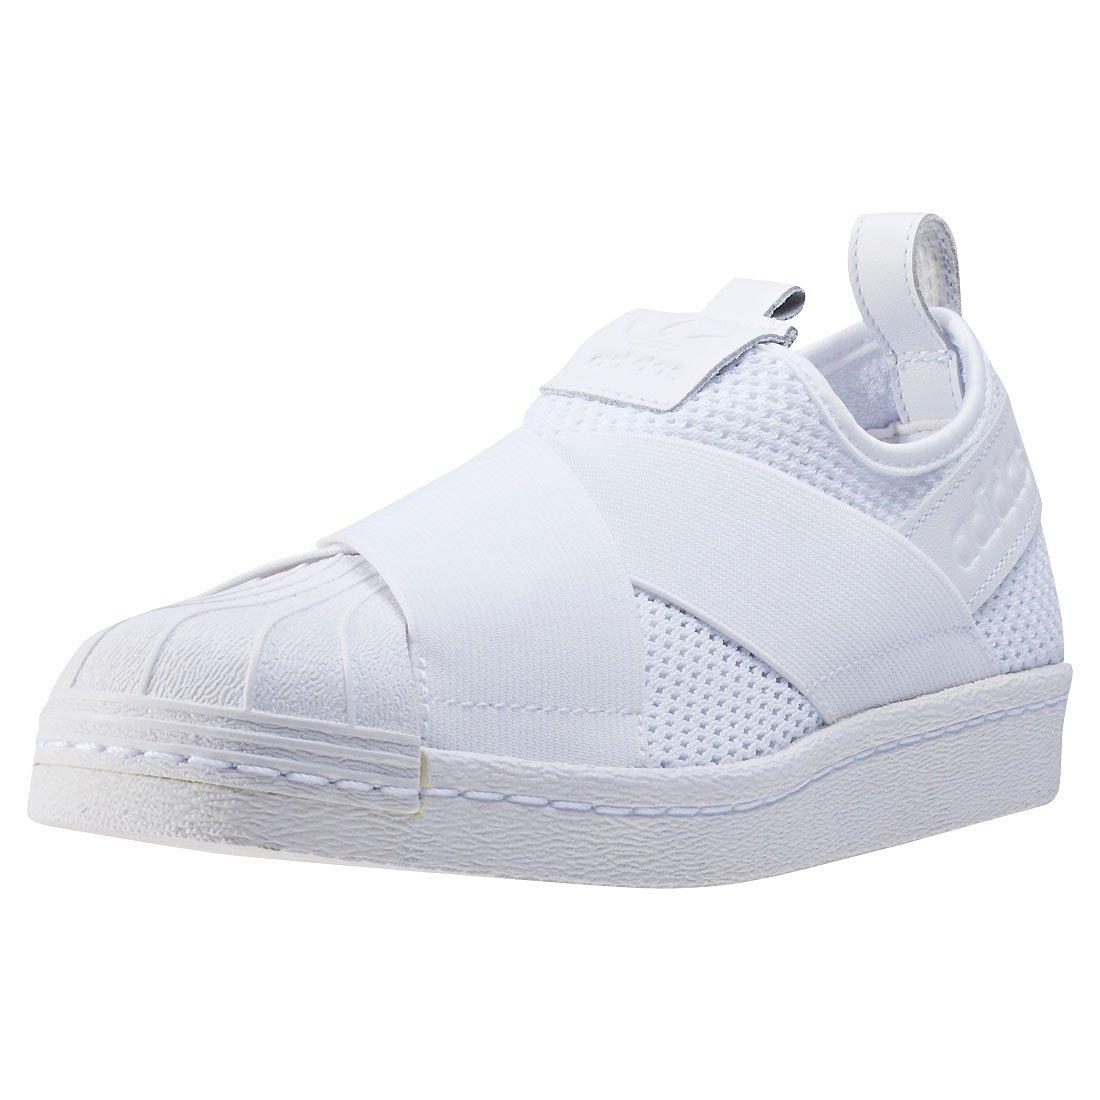 adidas Damen Superstar Slipon W Fitnessschuhe, Schwarz  42 2/3 EU|Wei? (Ftwbla/Ftwbla/Negbas)